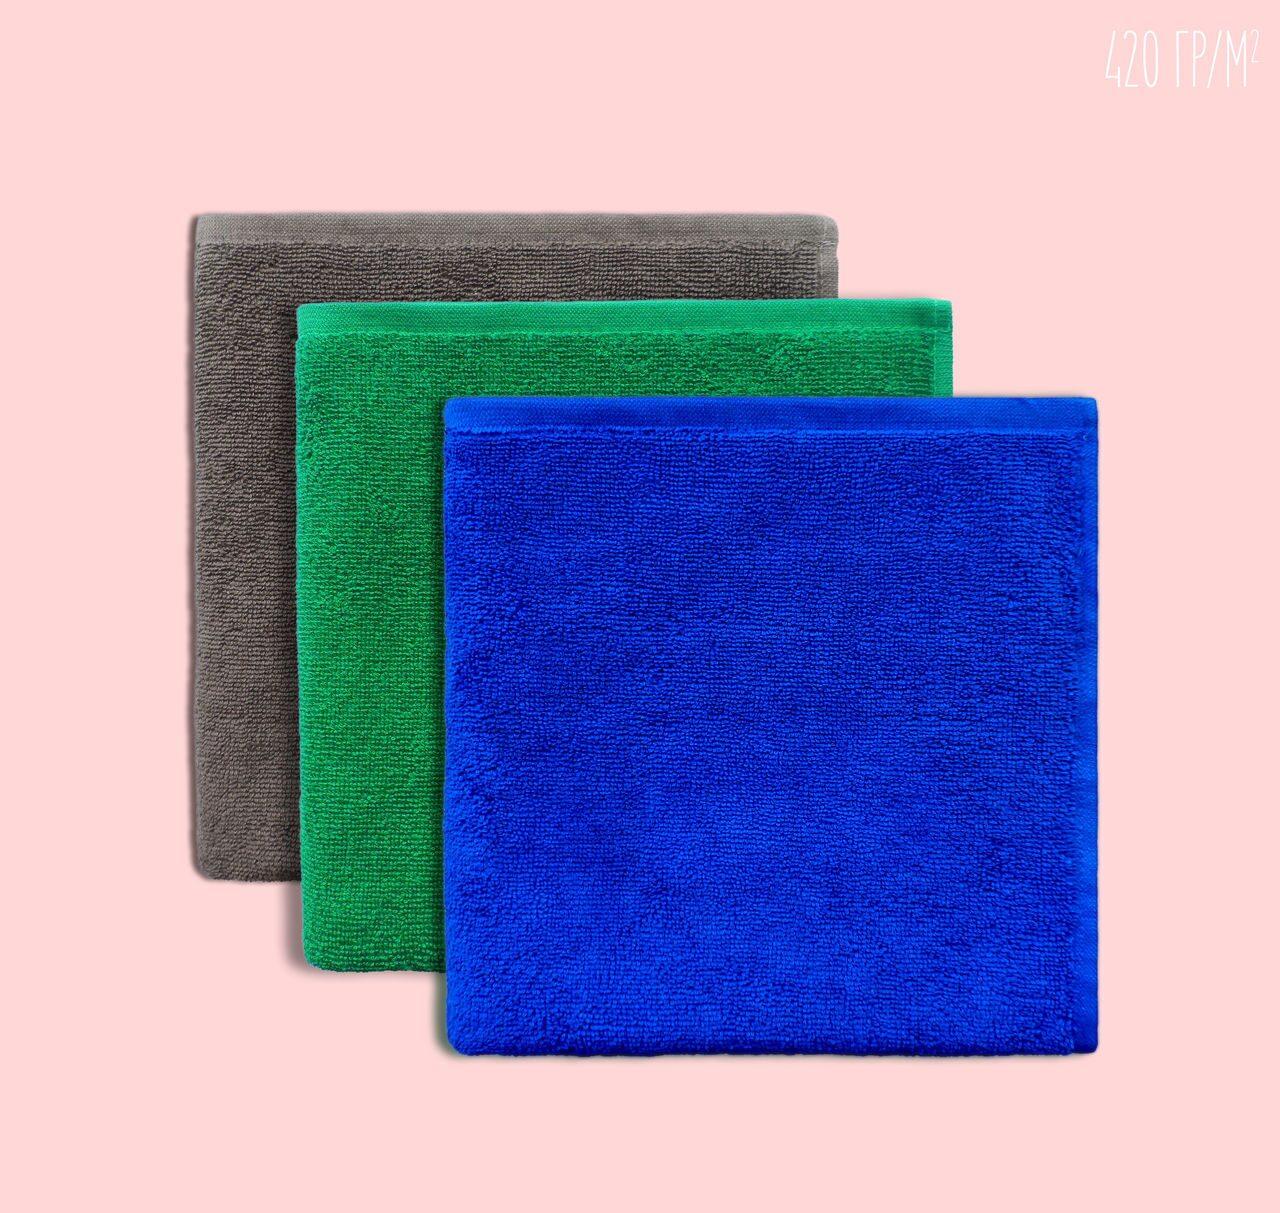 однотонные полотенца 420 гр